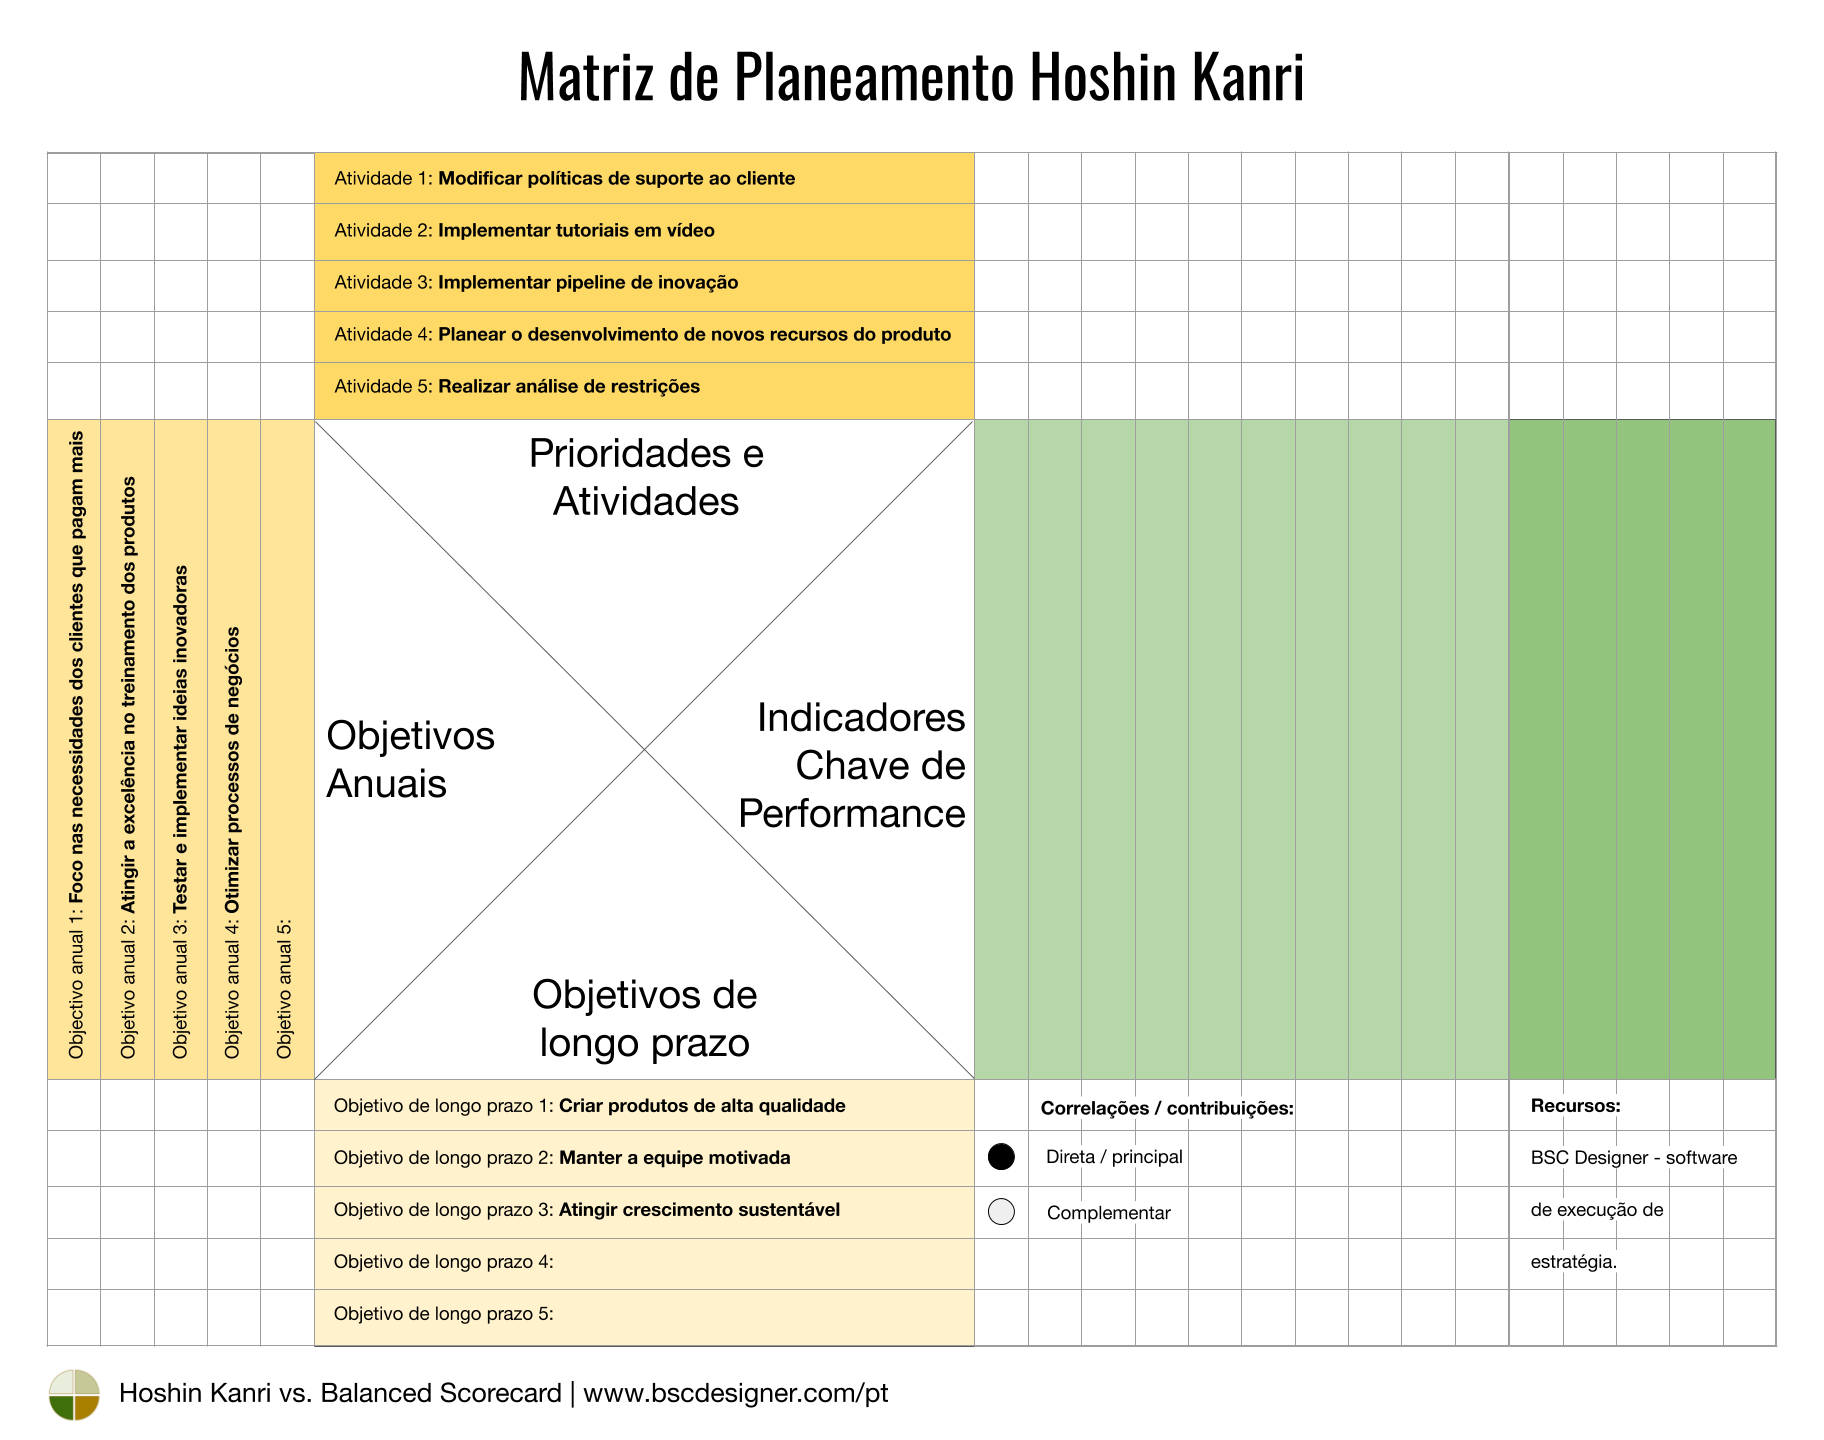 Hoshin Kanri - prioridades e atividades